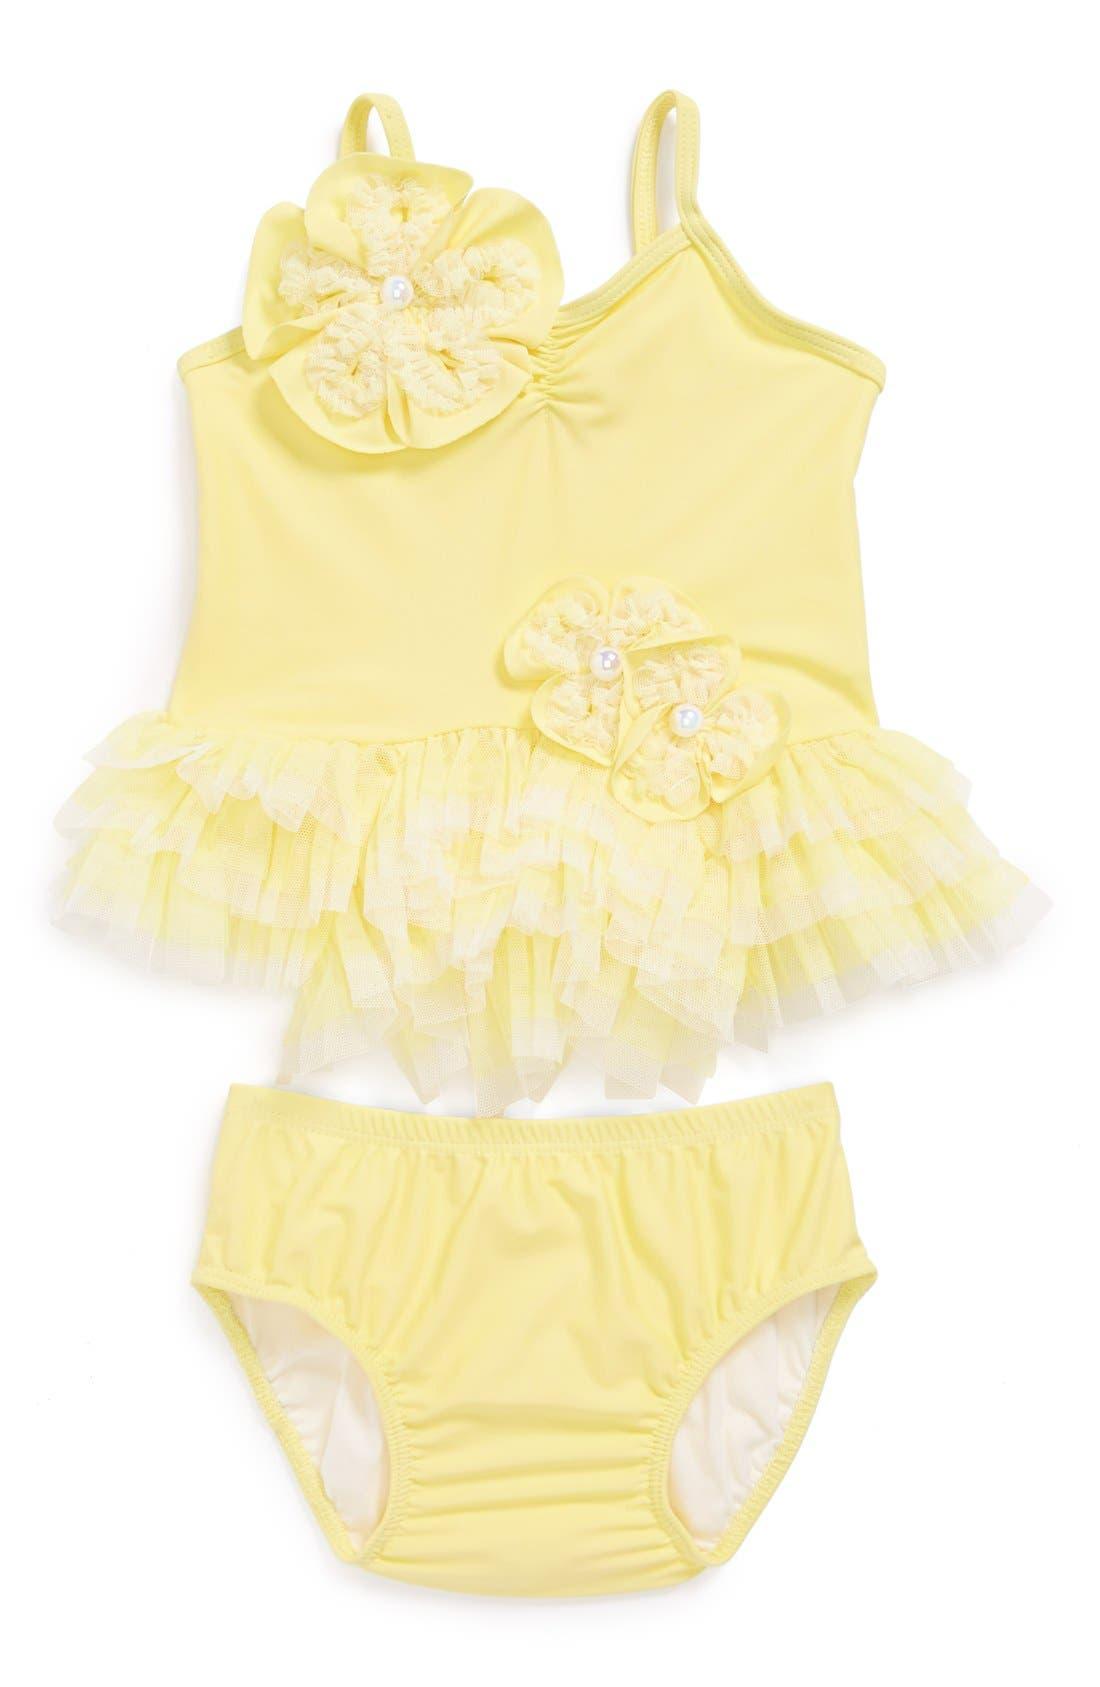 Main Image - Isobella & Chloe 'Lemon Drop' Two-Piece Swimsuit (Baby Girls)